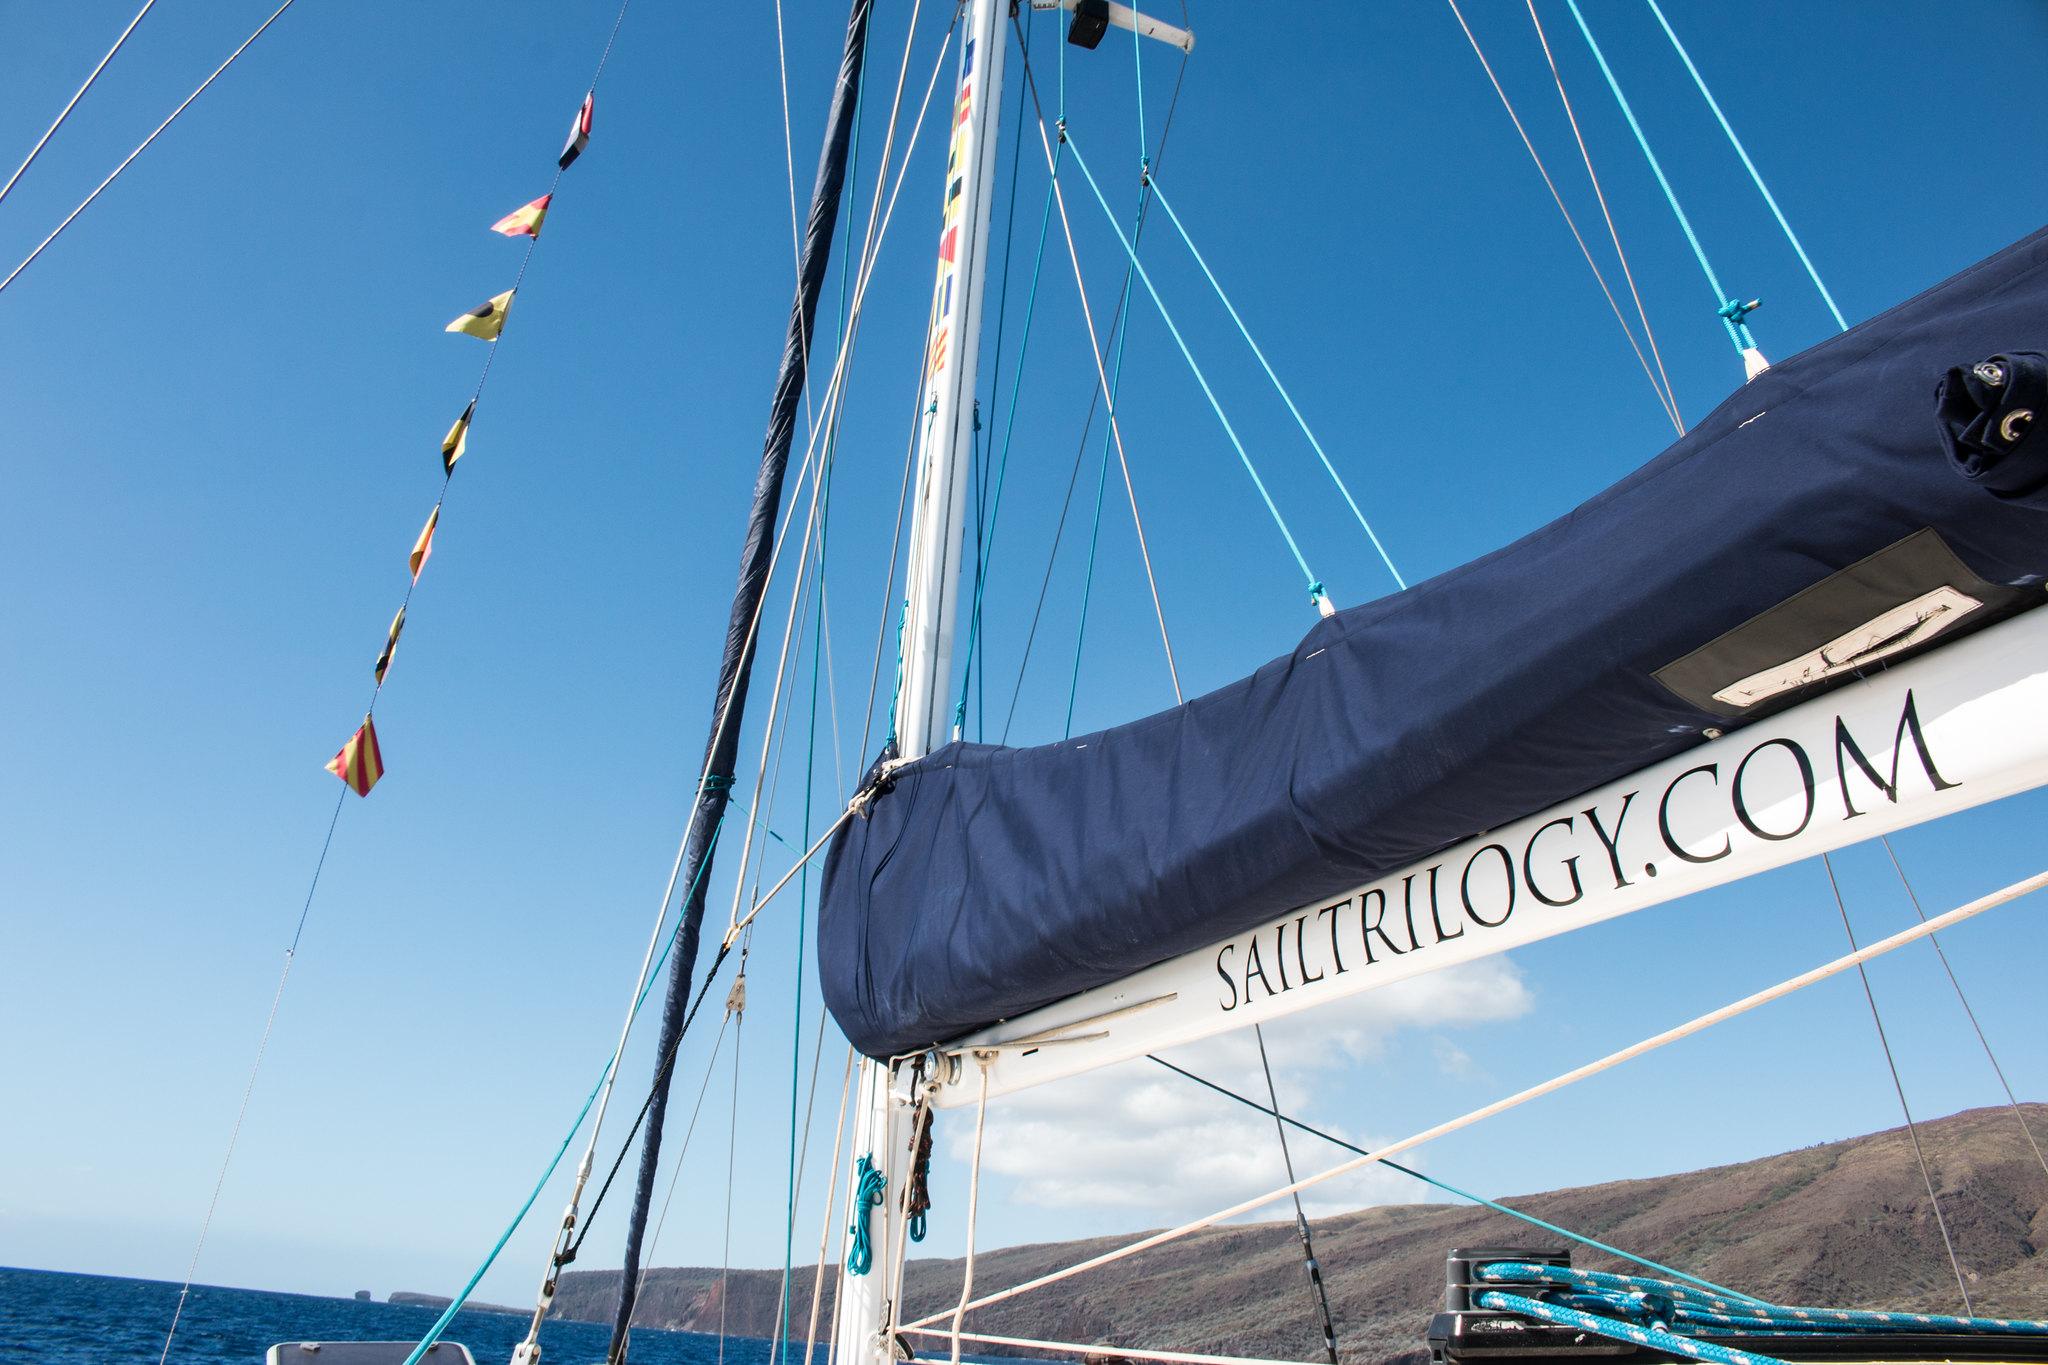 SailTrilogy